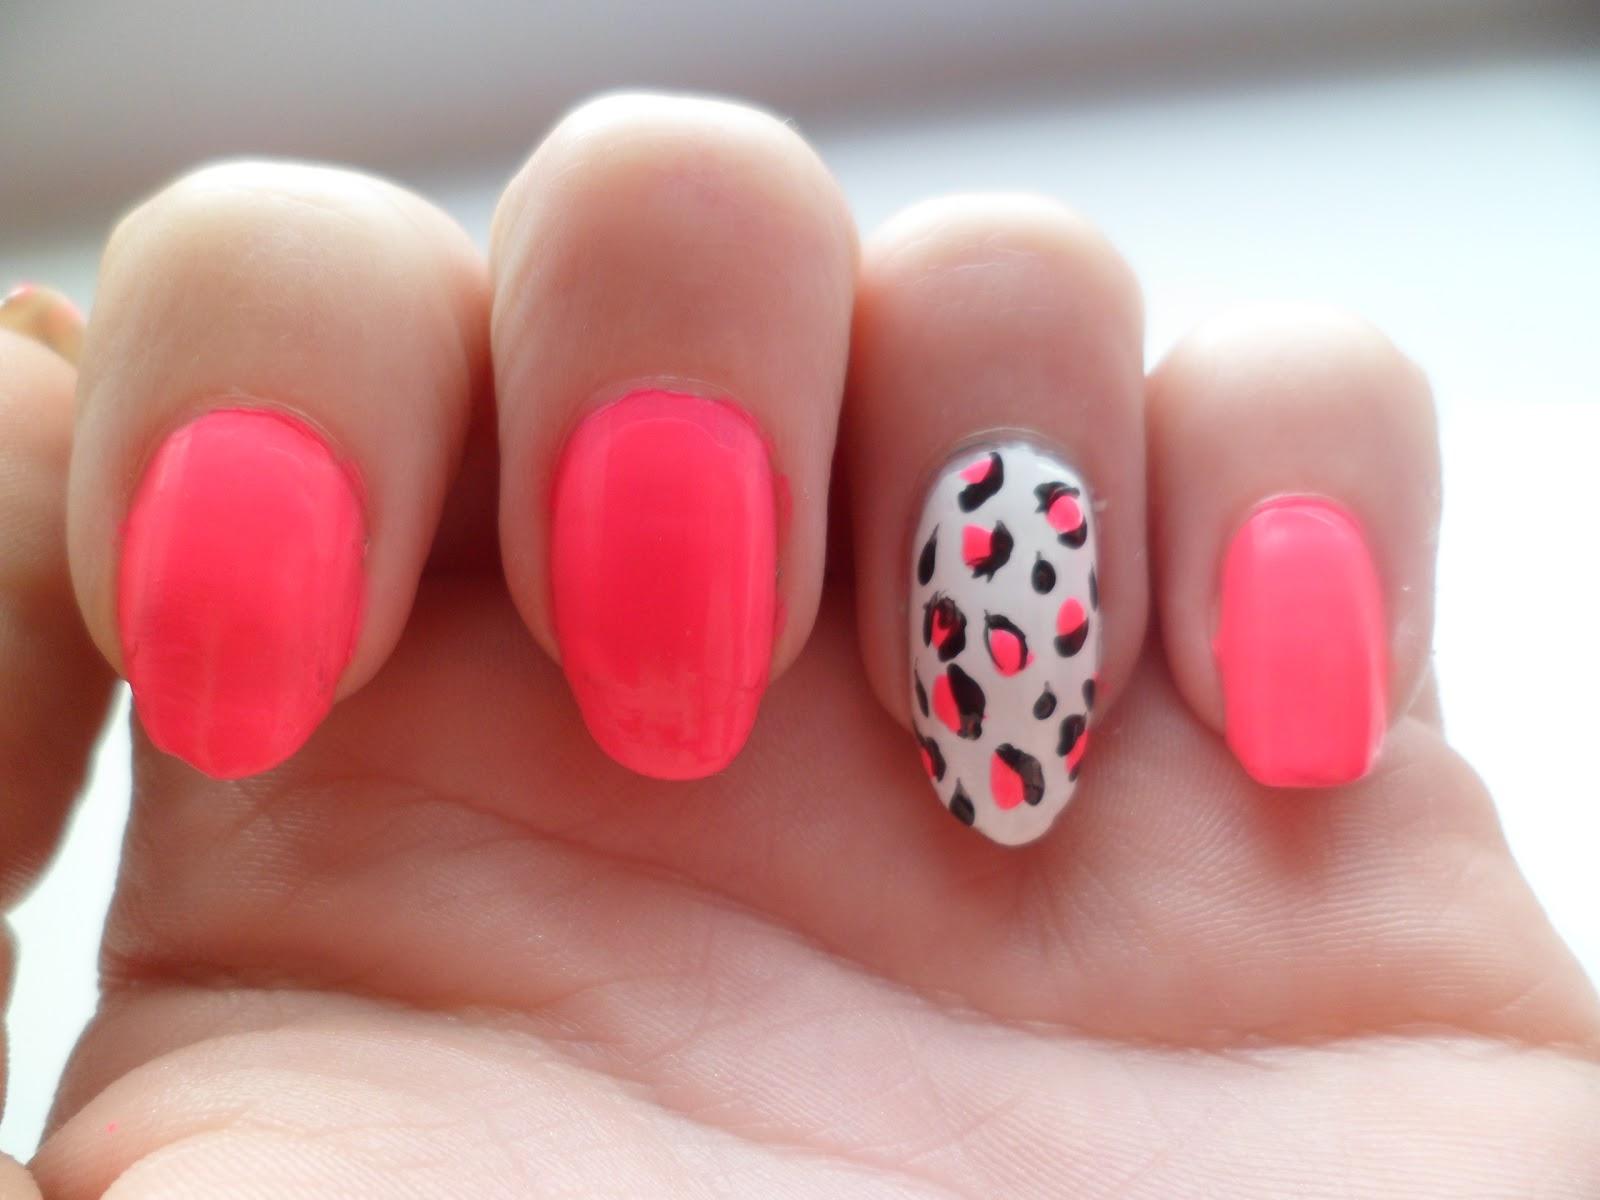 Neon Pink Animal Print Nail Art - Jenna Suth